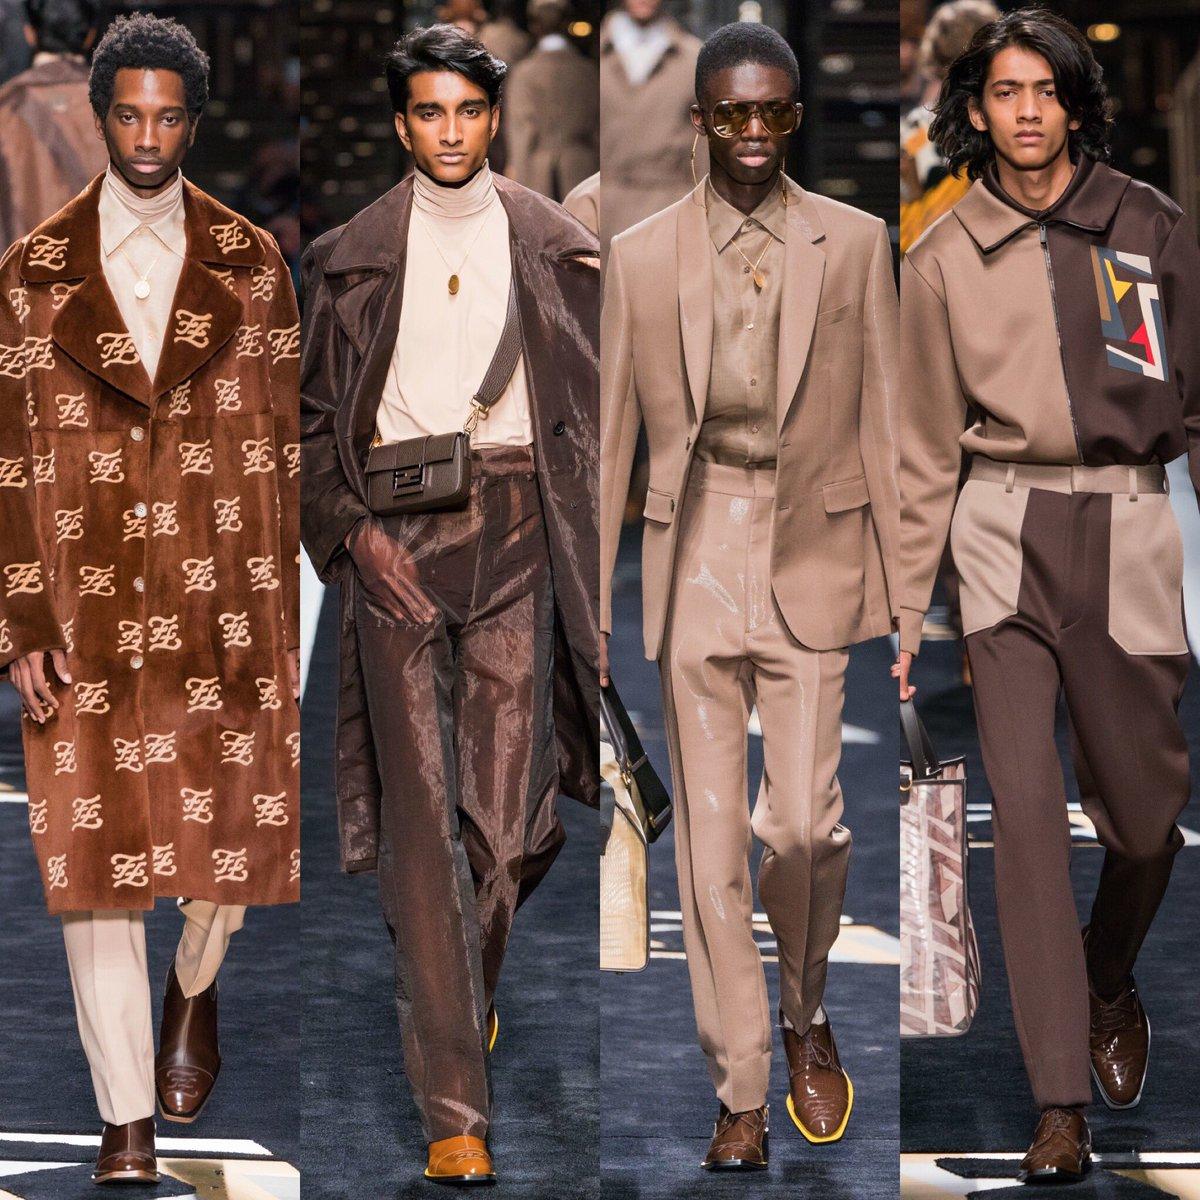 Fendi Fall 2019 Menswear Collection 🧡